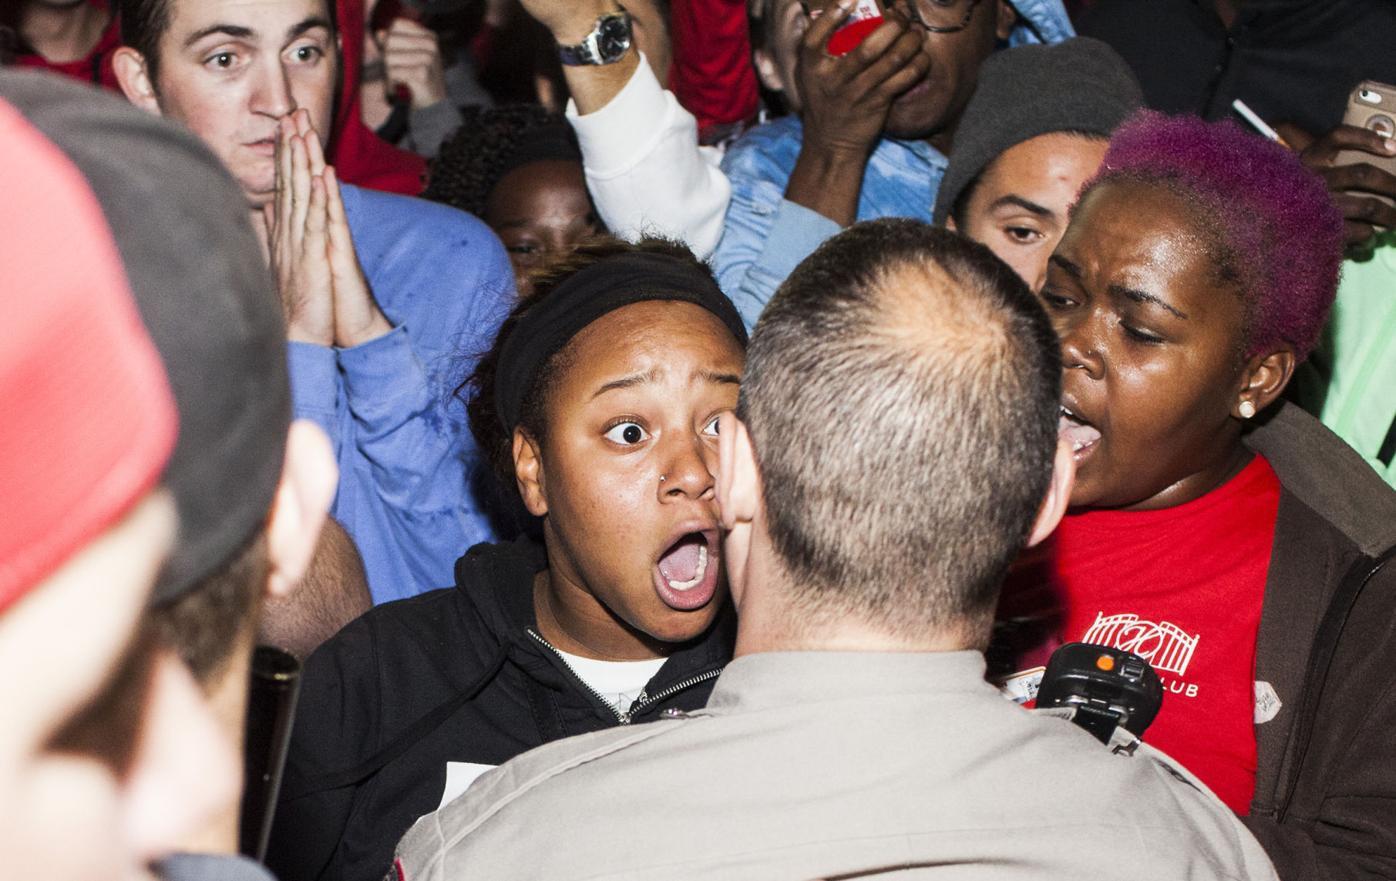 Anti-Trump protestors and Trump supporters clash at WKU